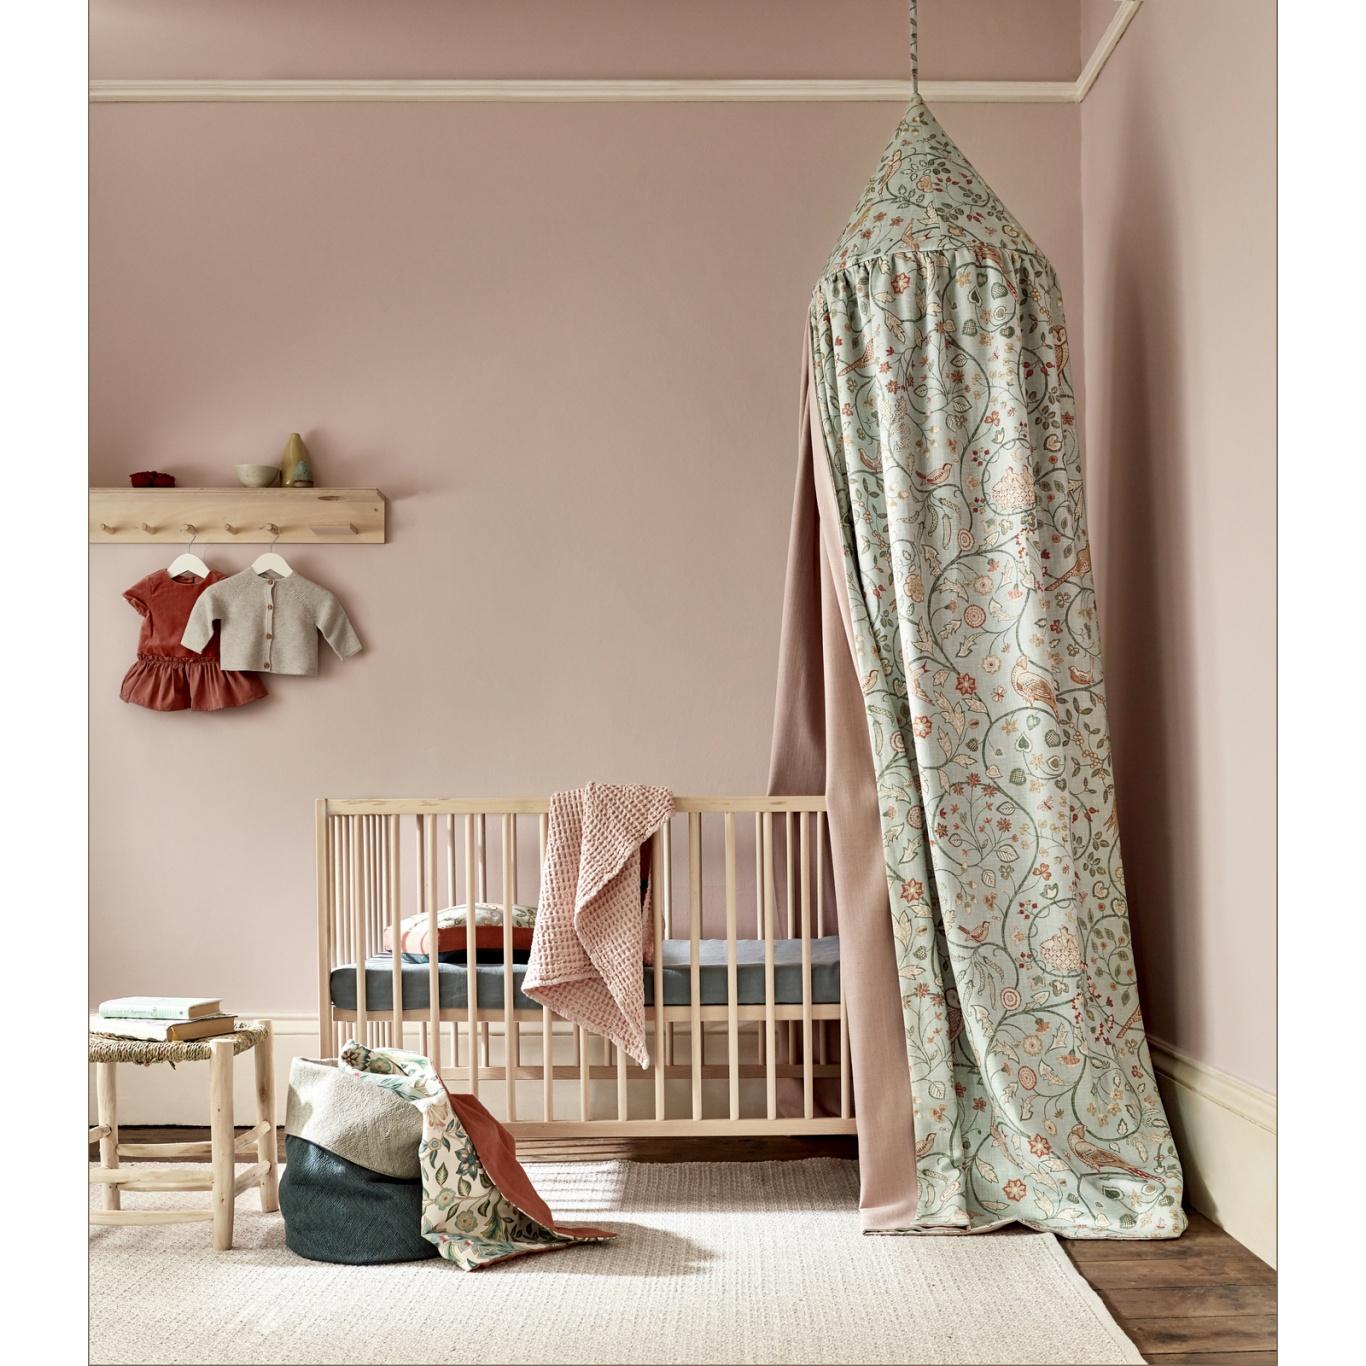 Morris & Co Newill Chintz Fabric 226589